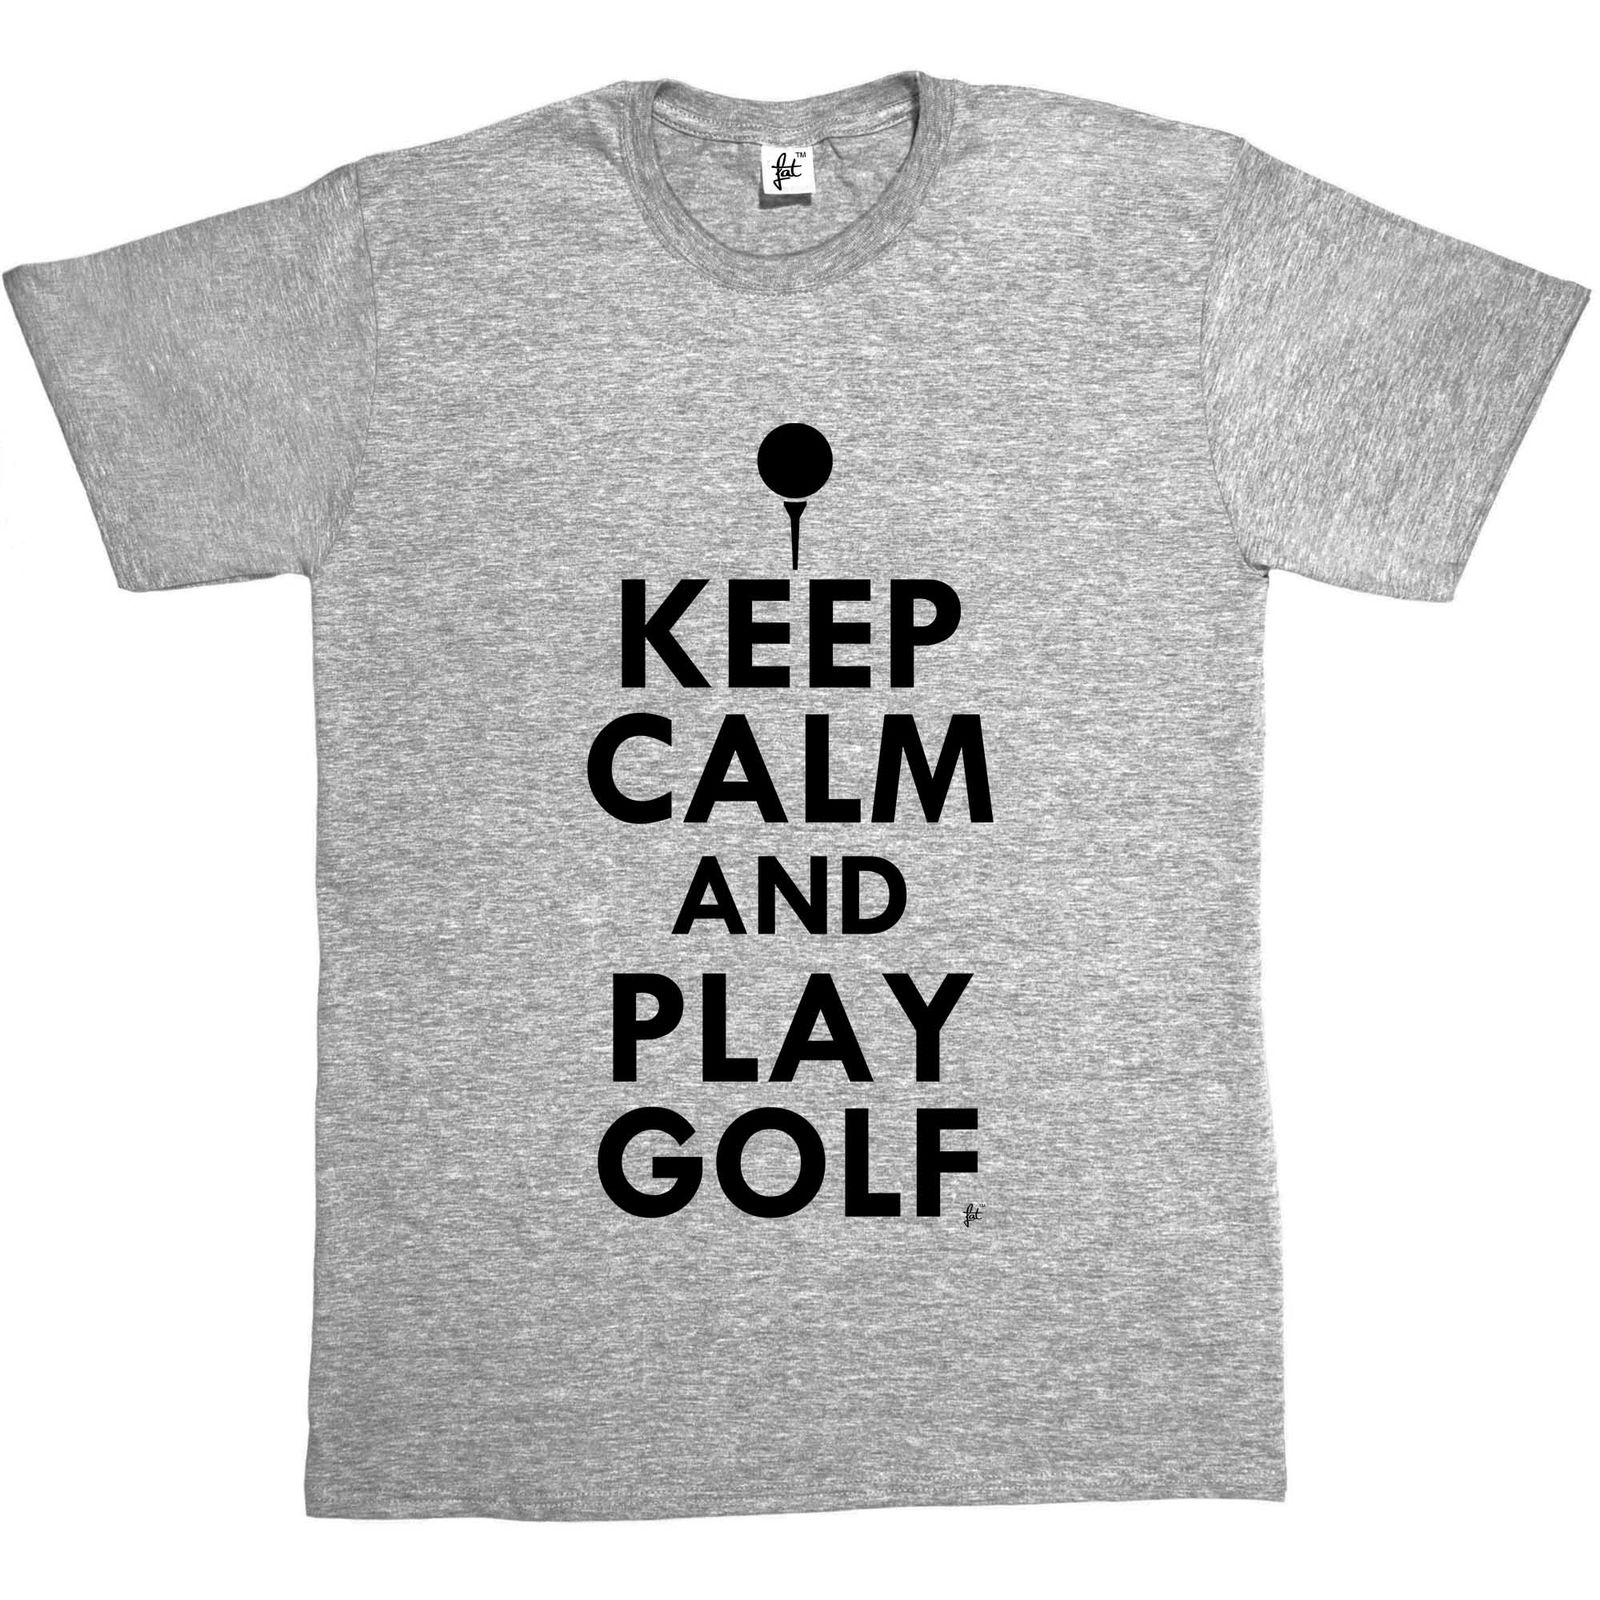 Keep Calm & Play GolfED - Golfed Ball Mens T-Shirt